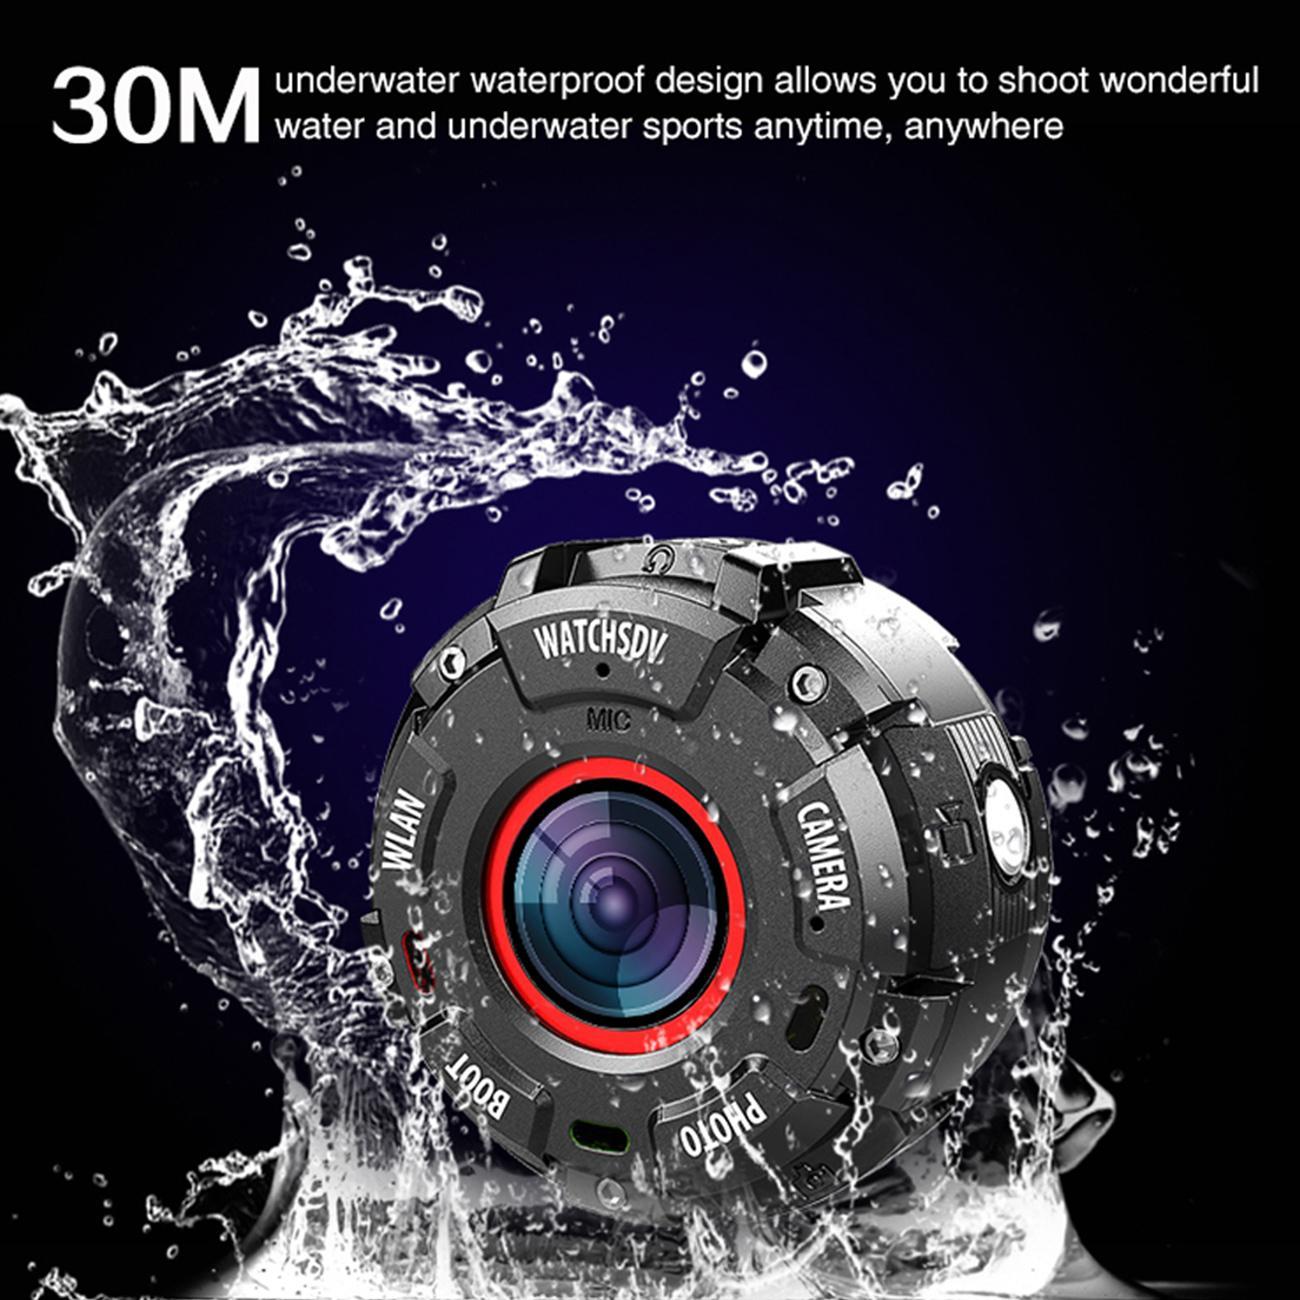 Smart Watch Mini Sport Acción Cámara HD1080P WiFi Impermeable 30M DV 5 PCS Lentes de gran angular Versión Noche Disparo SmartWatch CAM Digital Video Recorder